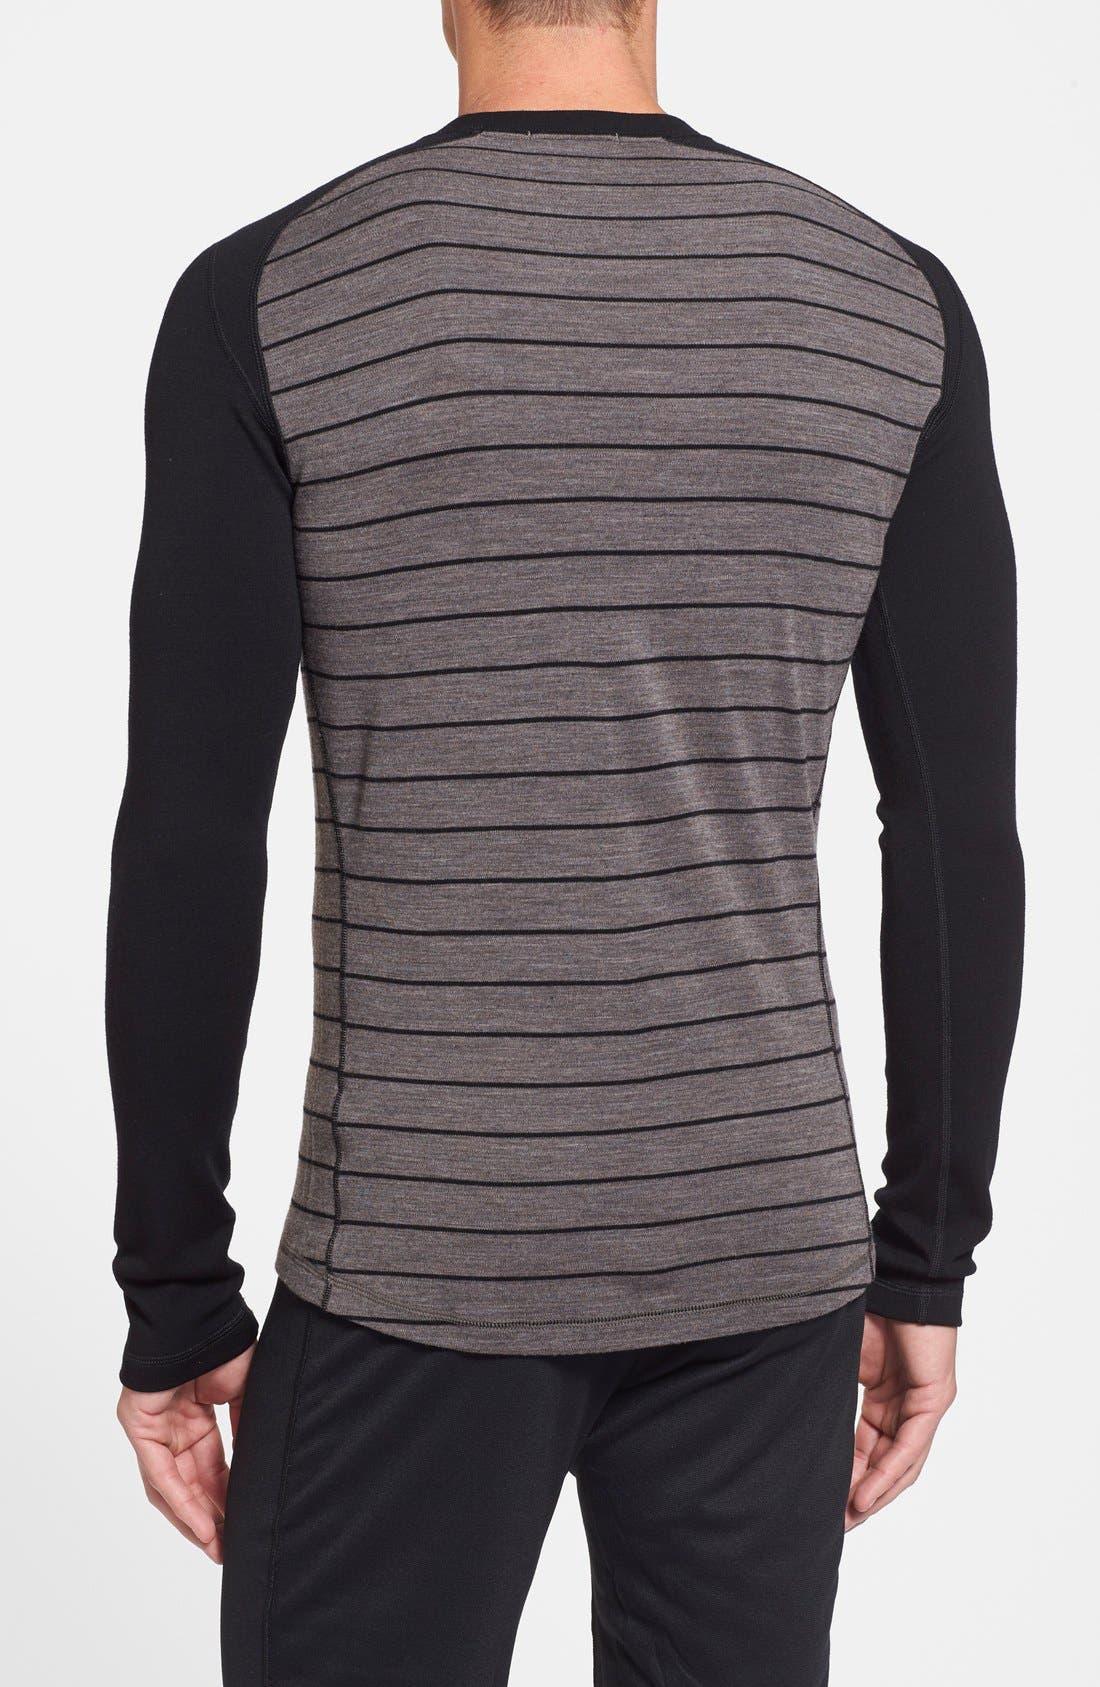 Alternate Image 2  - Smartwool 250g Base Layer Midweight Crewneck Shirt